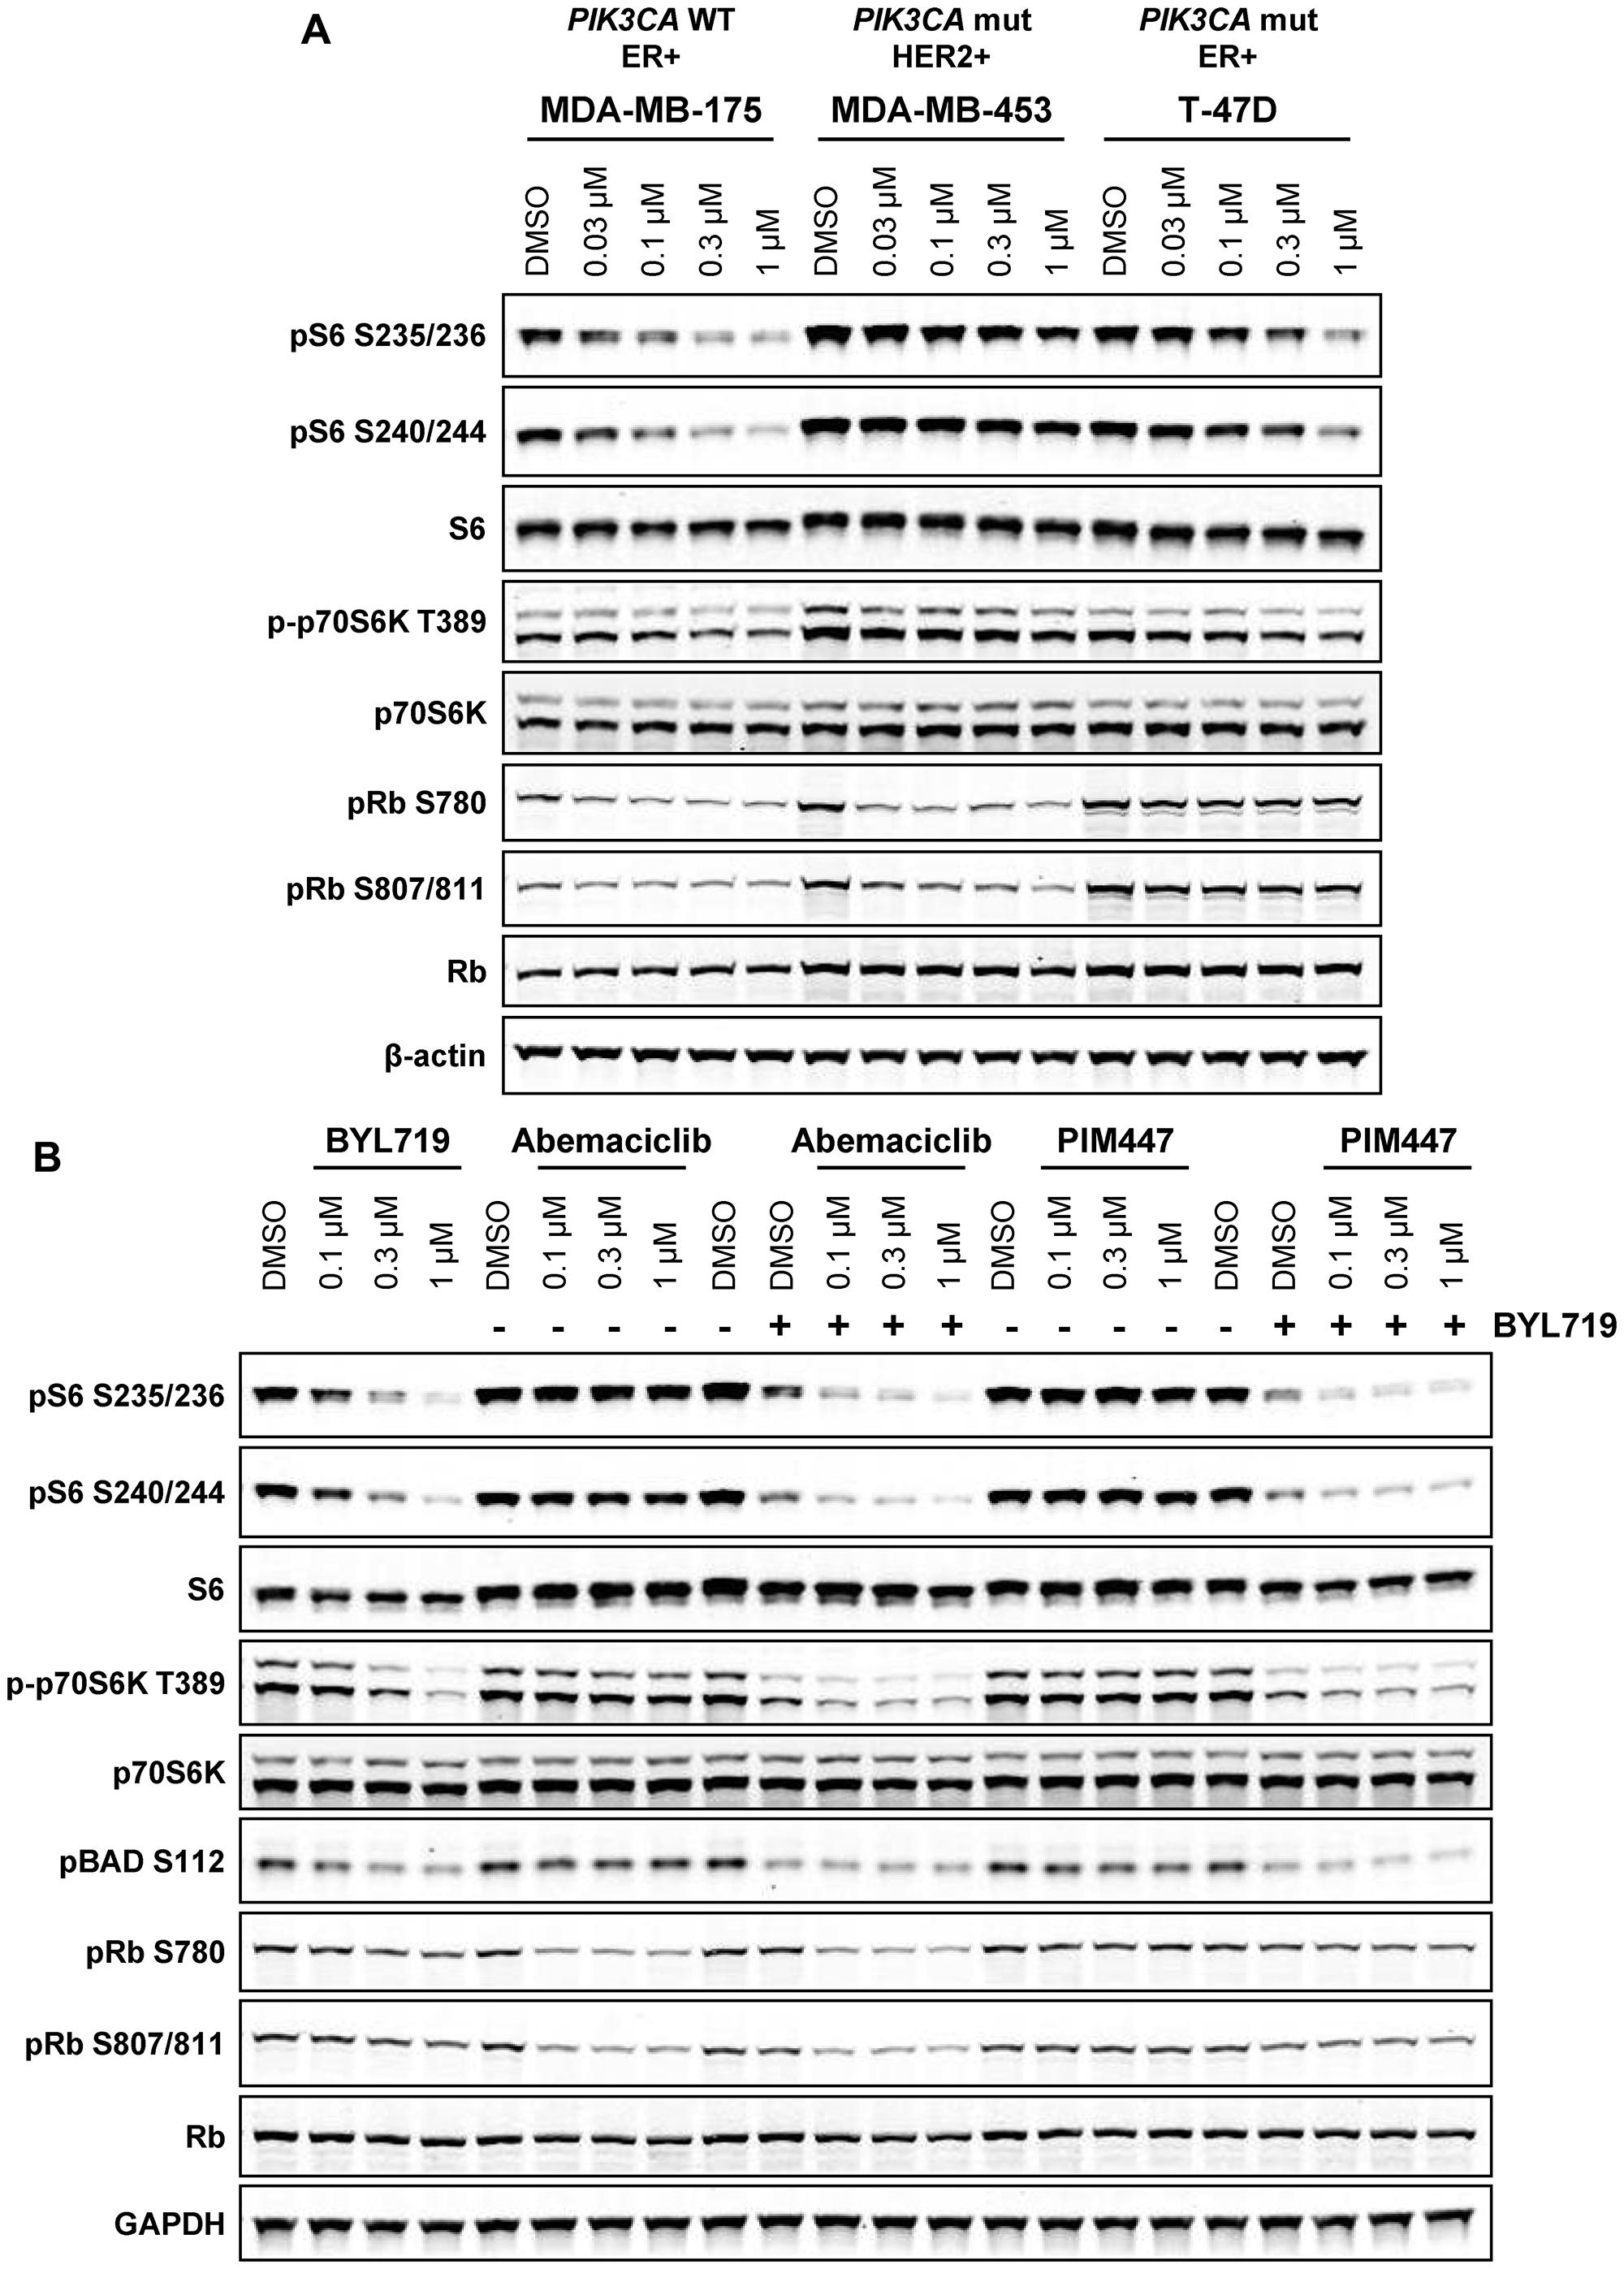 PI3K activity compensates for PIM inhibition in PIK3CA mutant breast cancer.